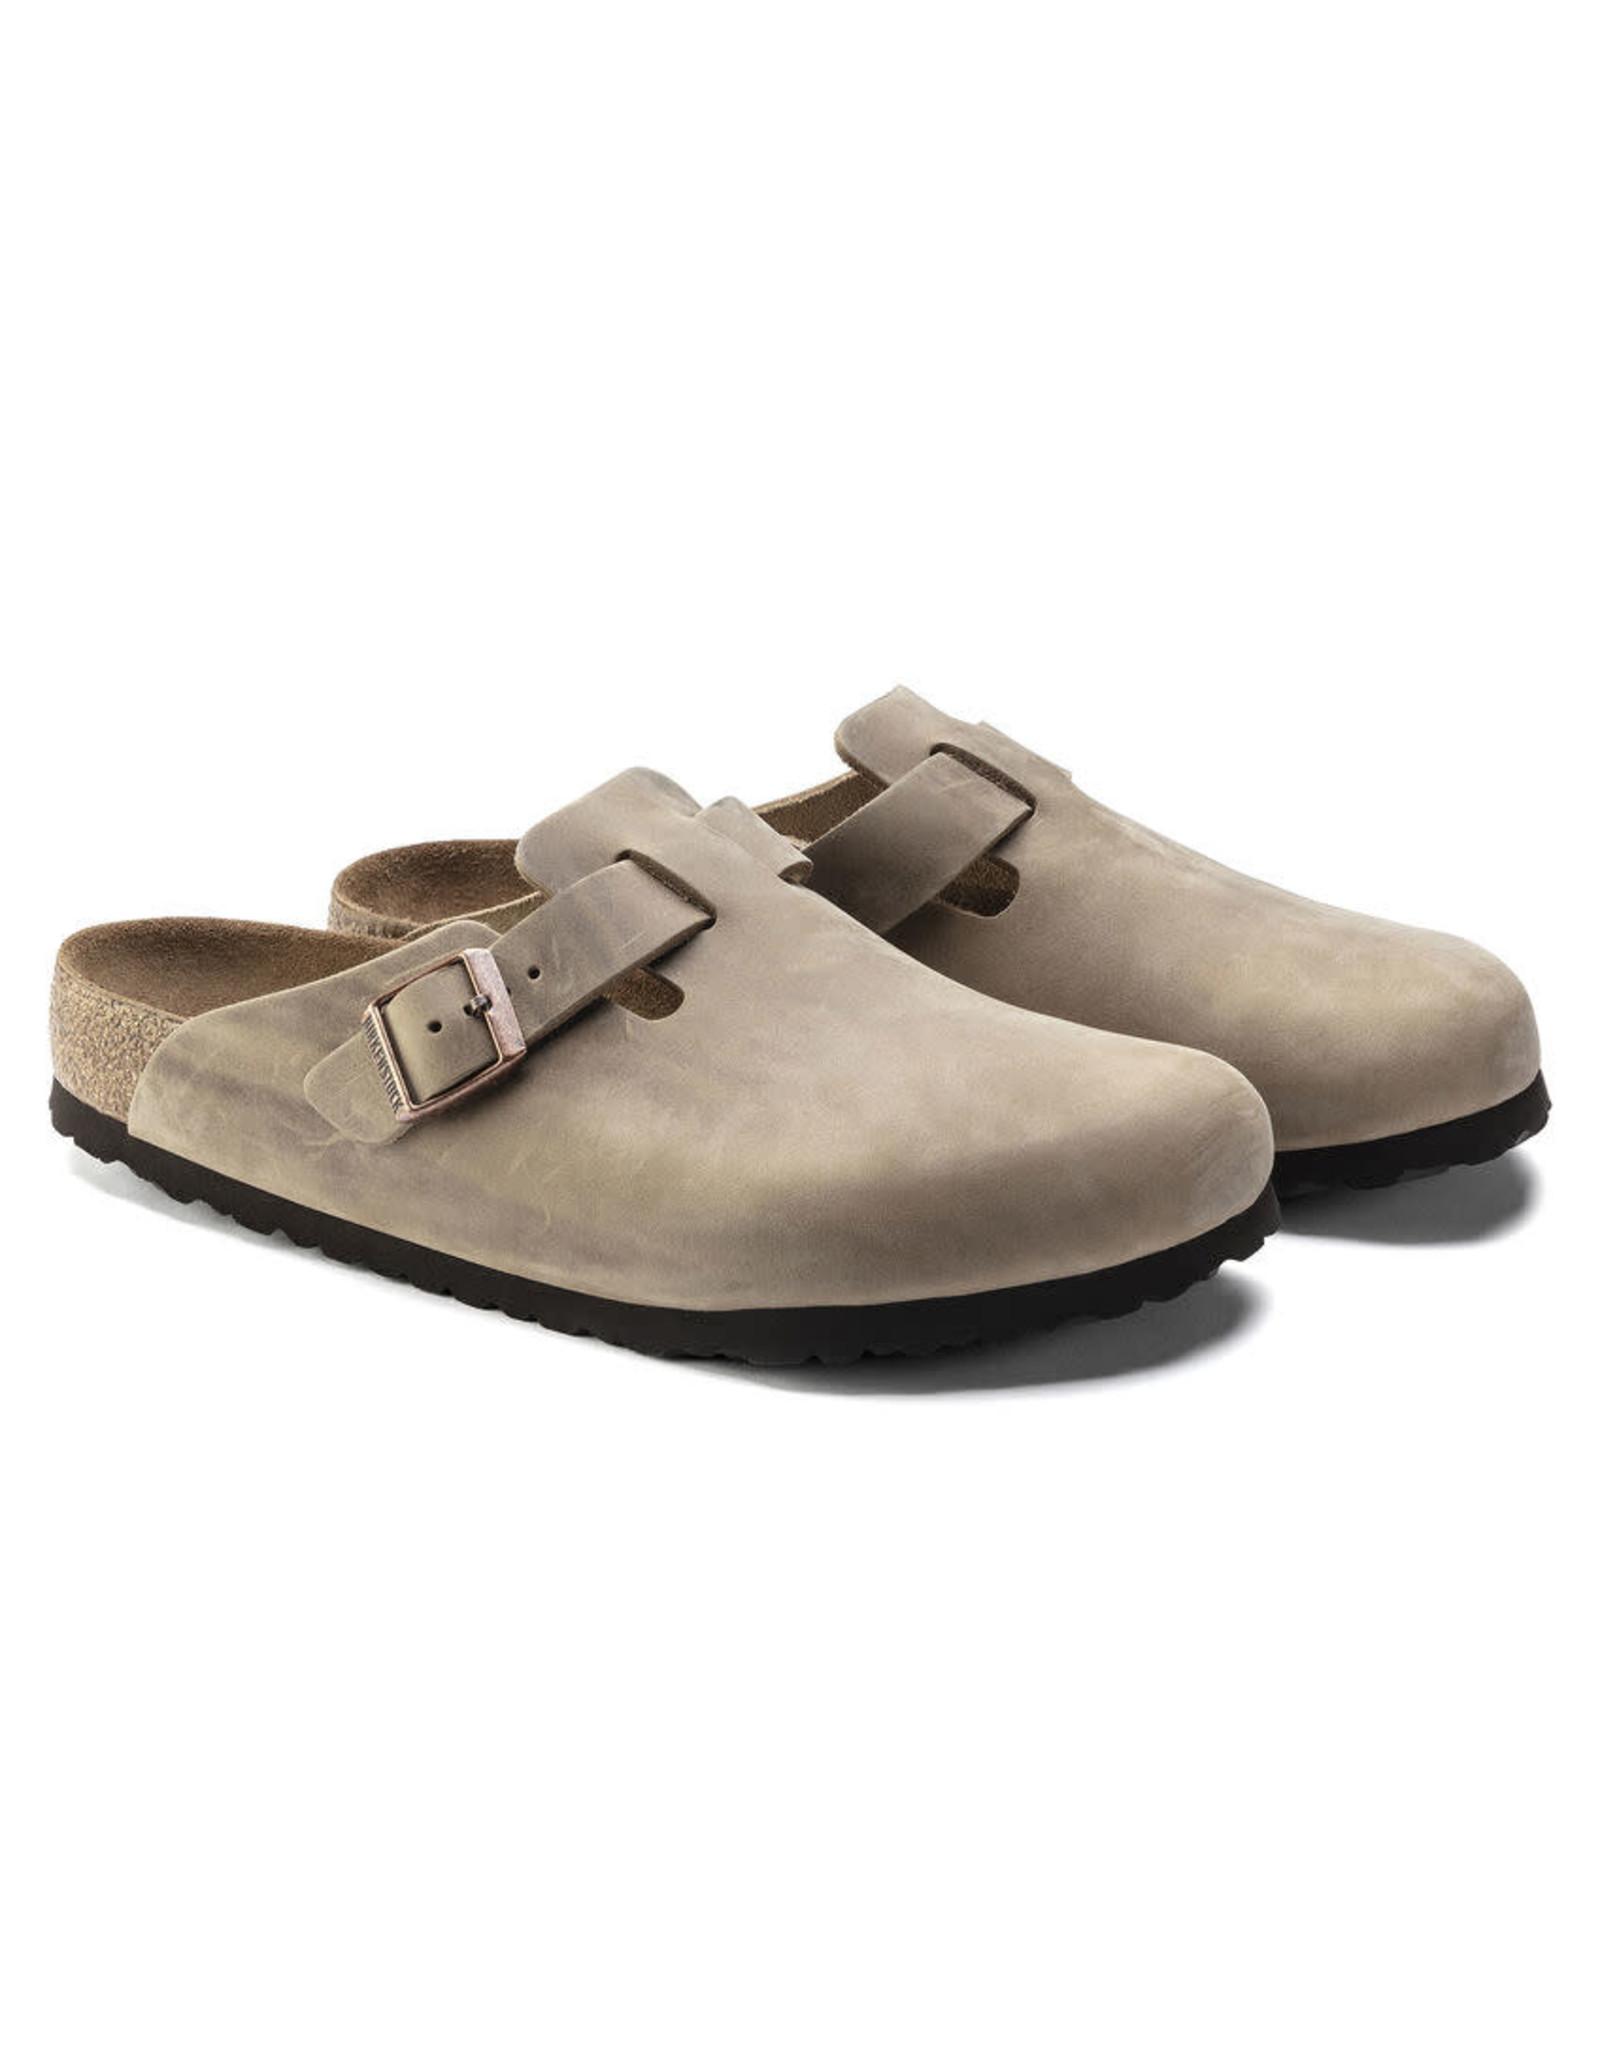 Birkenstock Boston Soft Footbed Clog